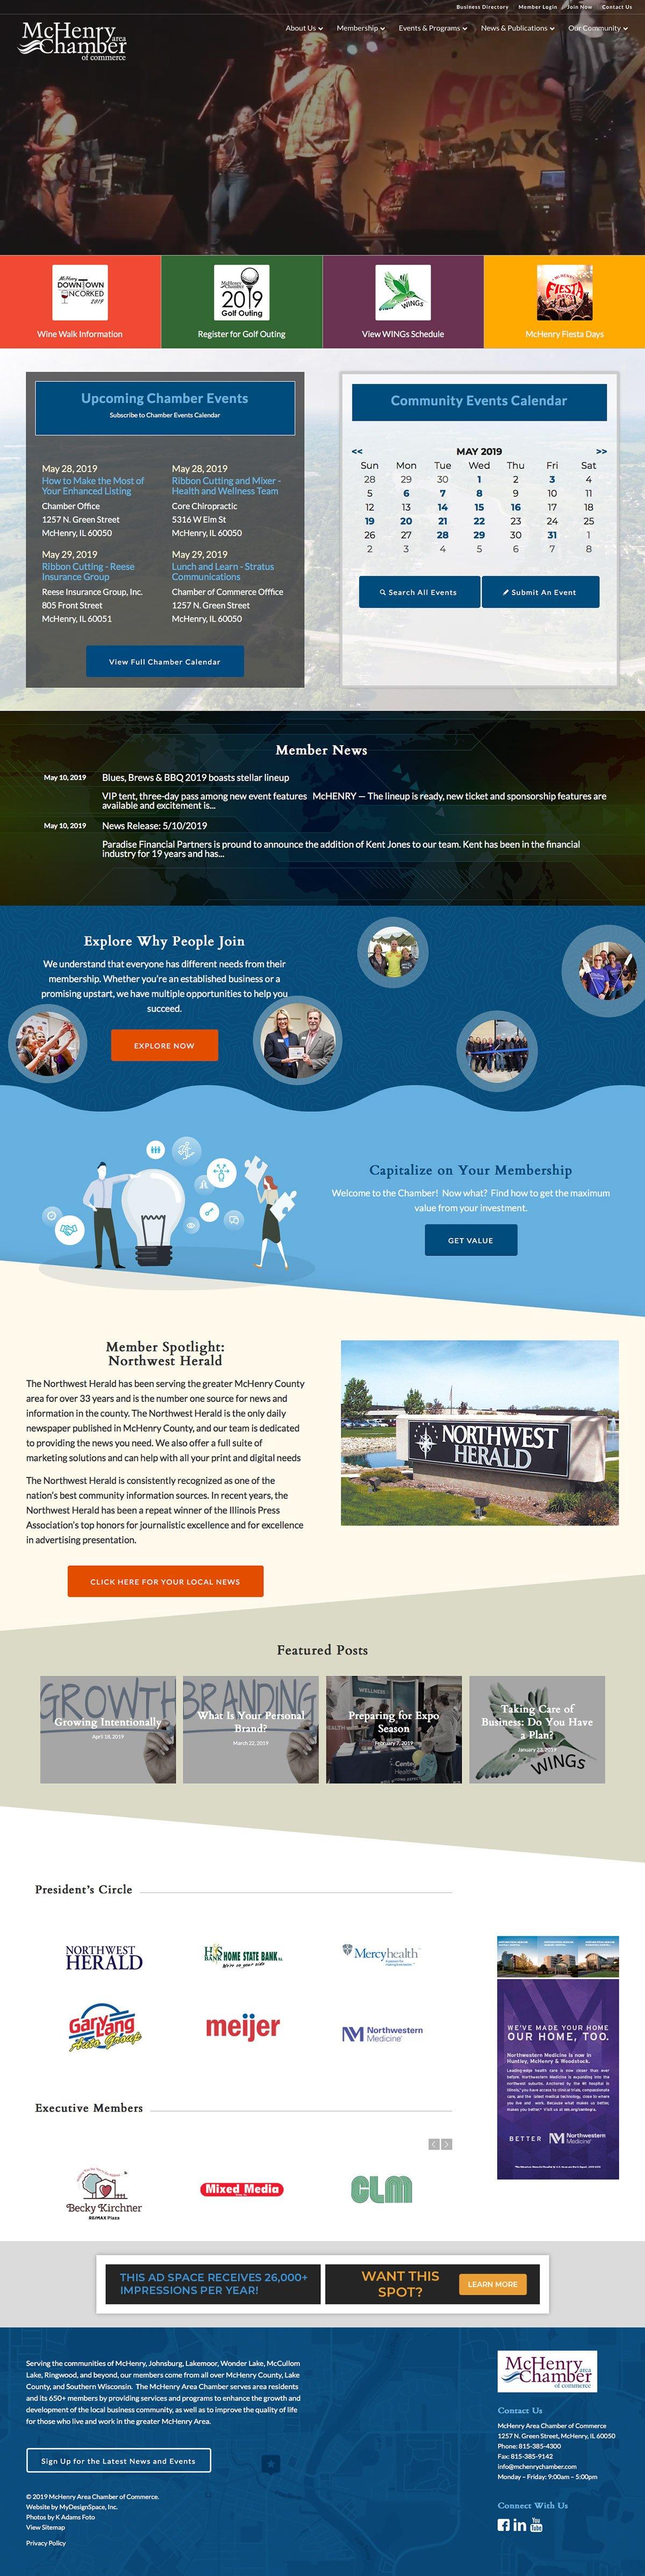 MACC Home Page